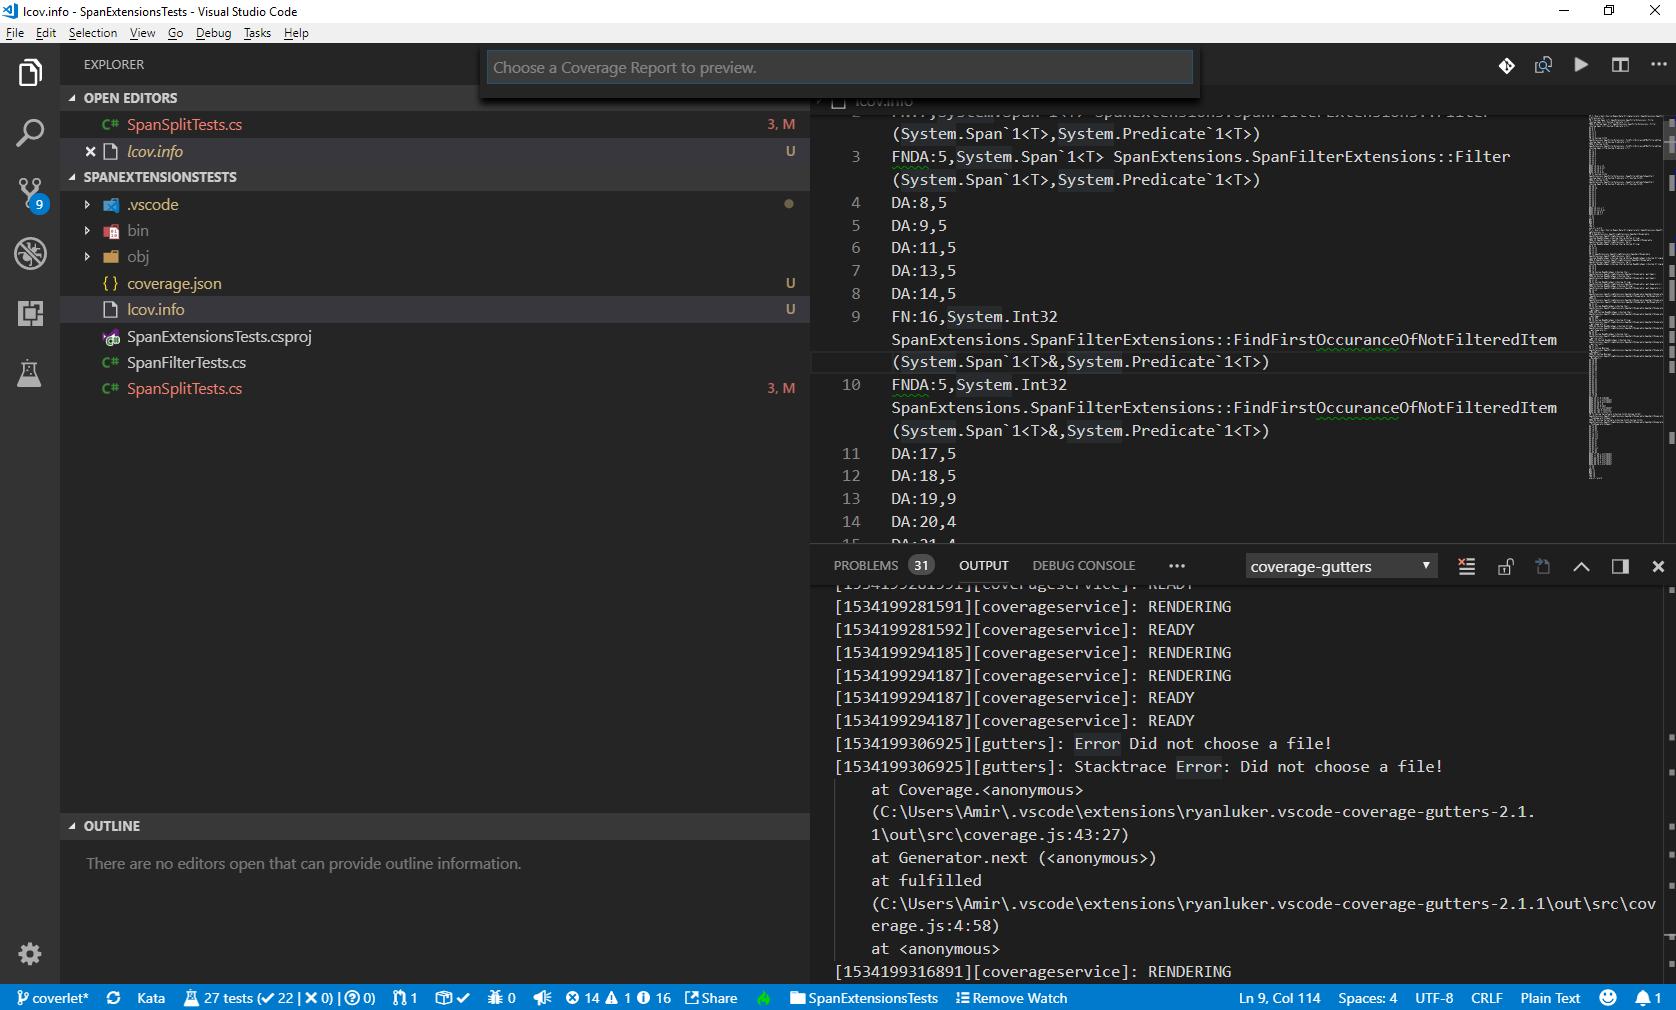 Cannot load coverage file · Issue #161 · ryanluker/vscode